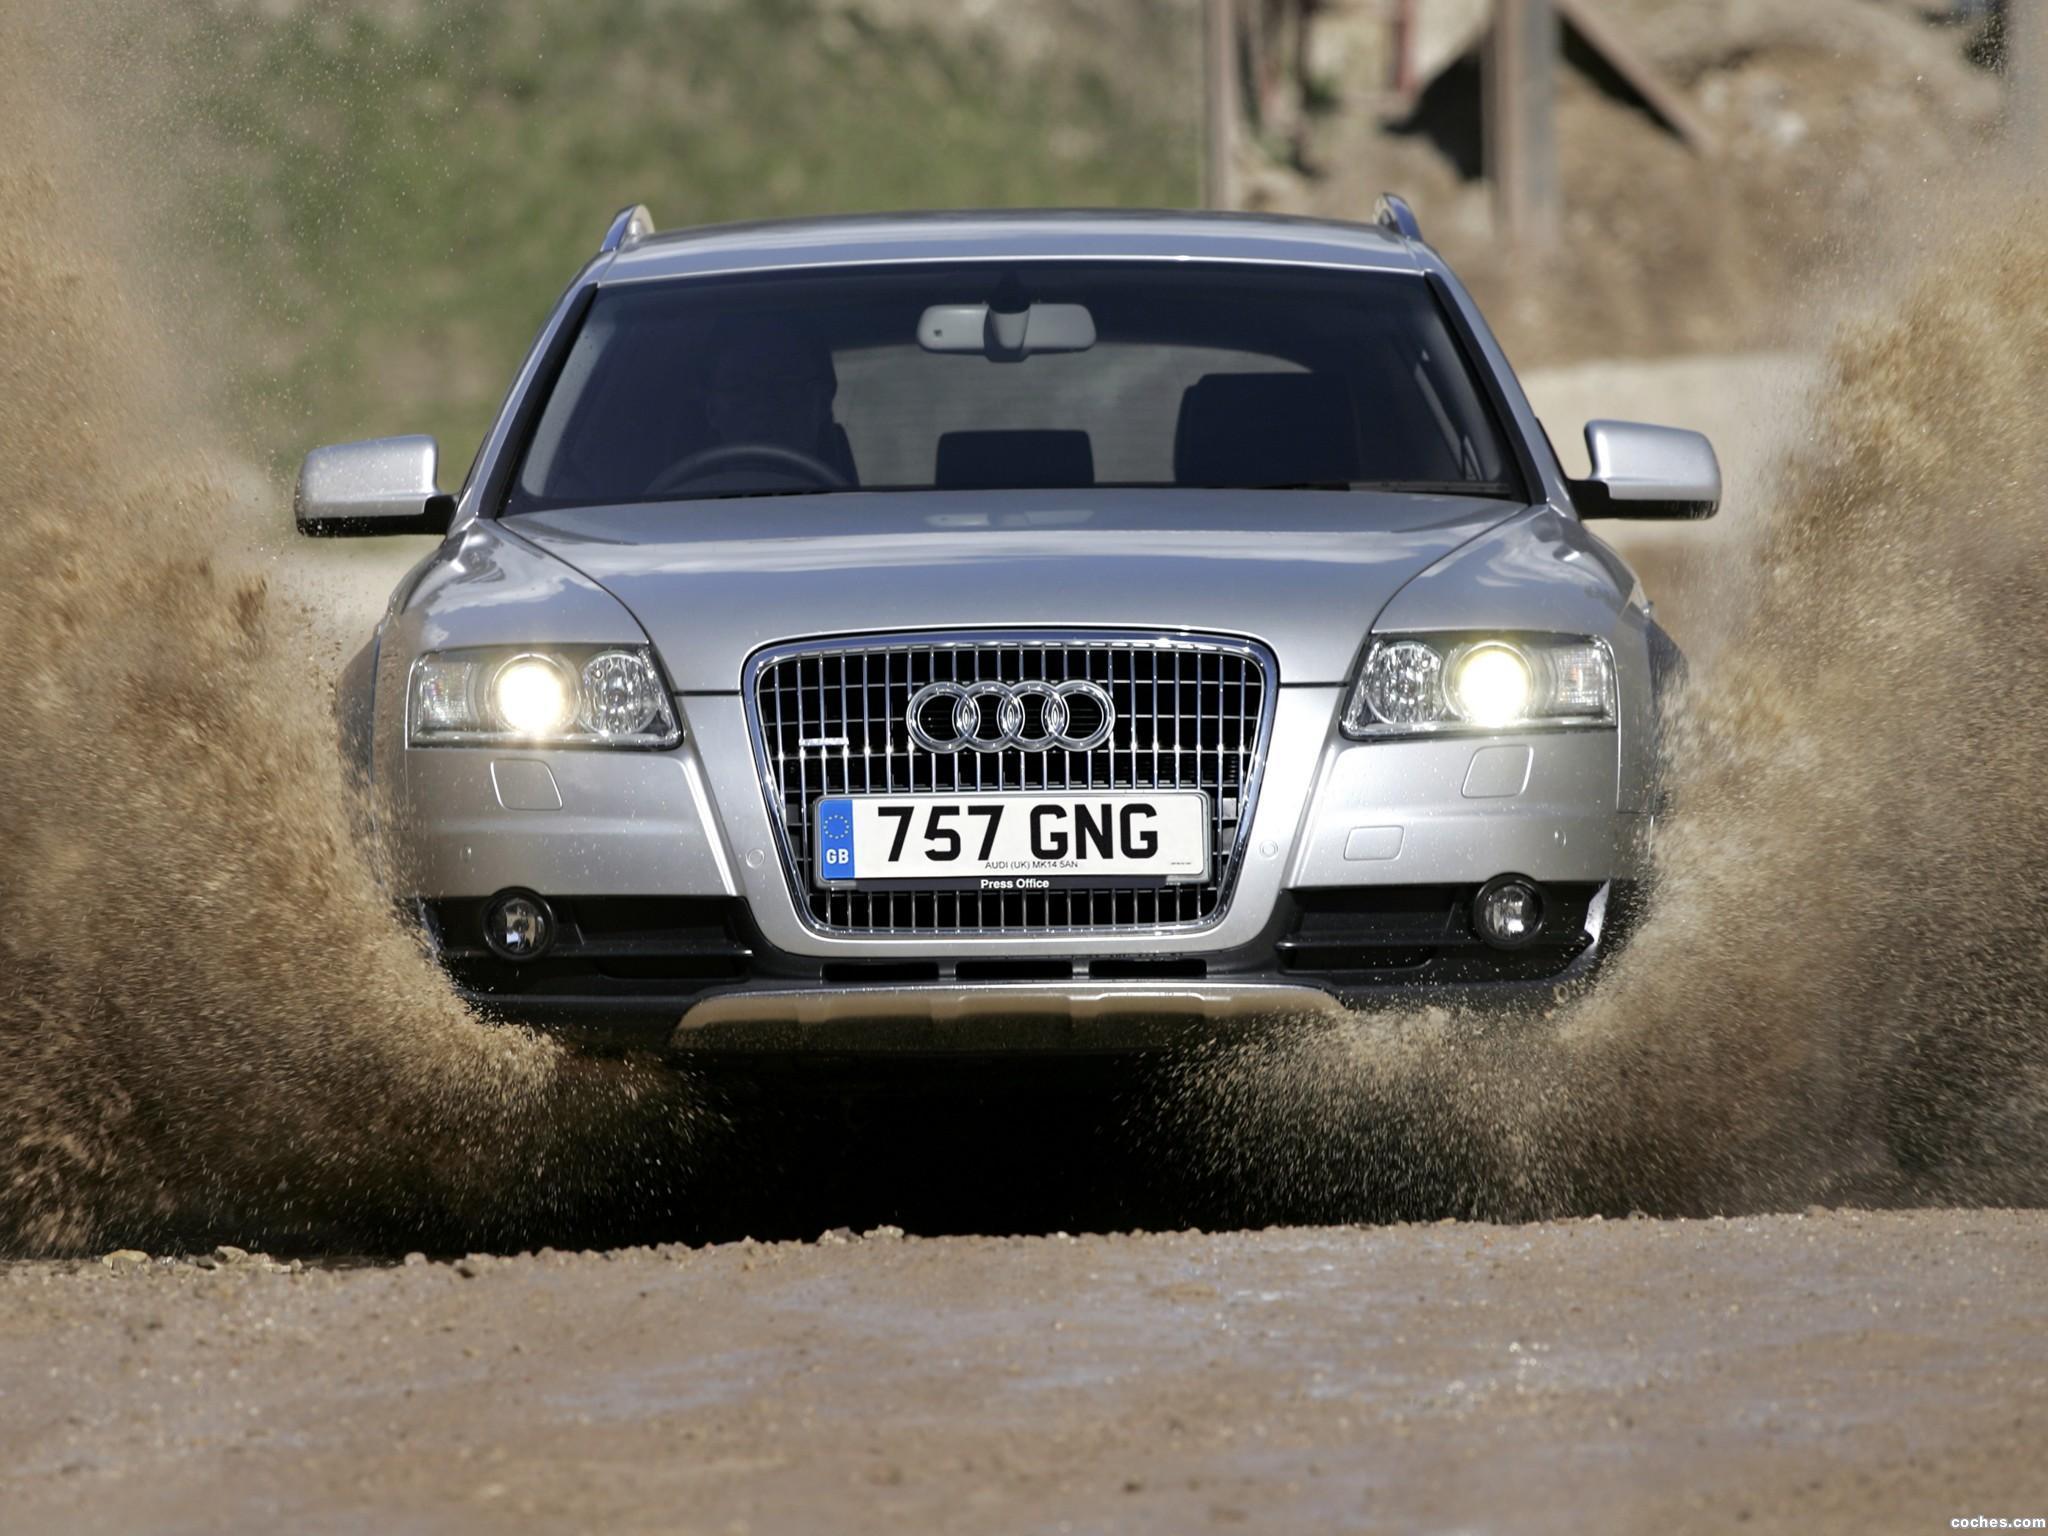 audi_a6-allroad-3-2-quattro-uk-2006-08_r6.jpg